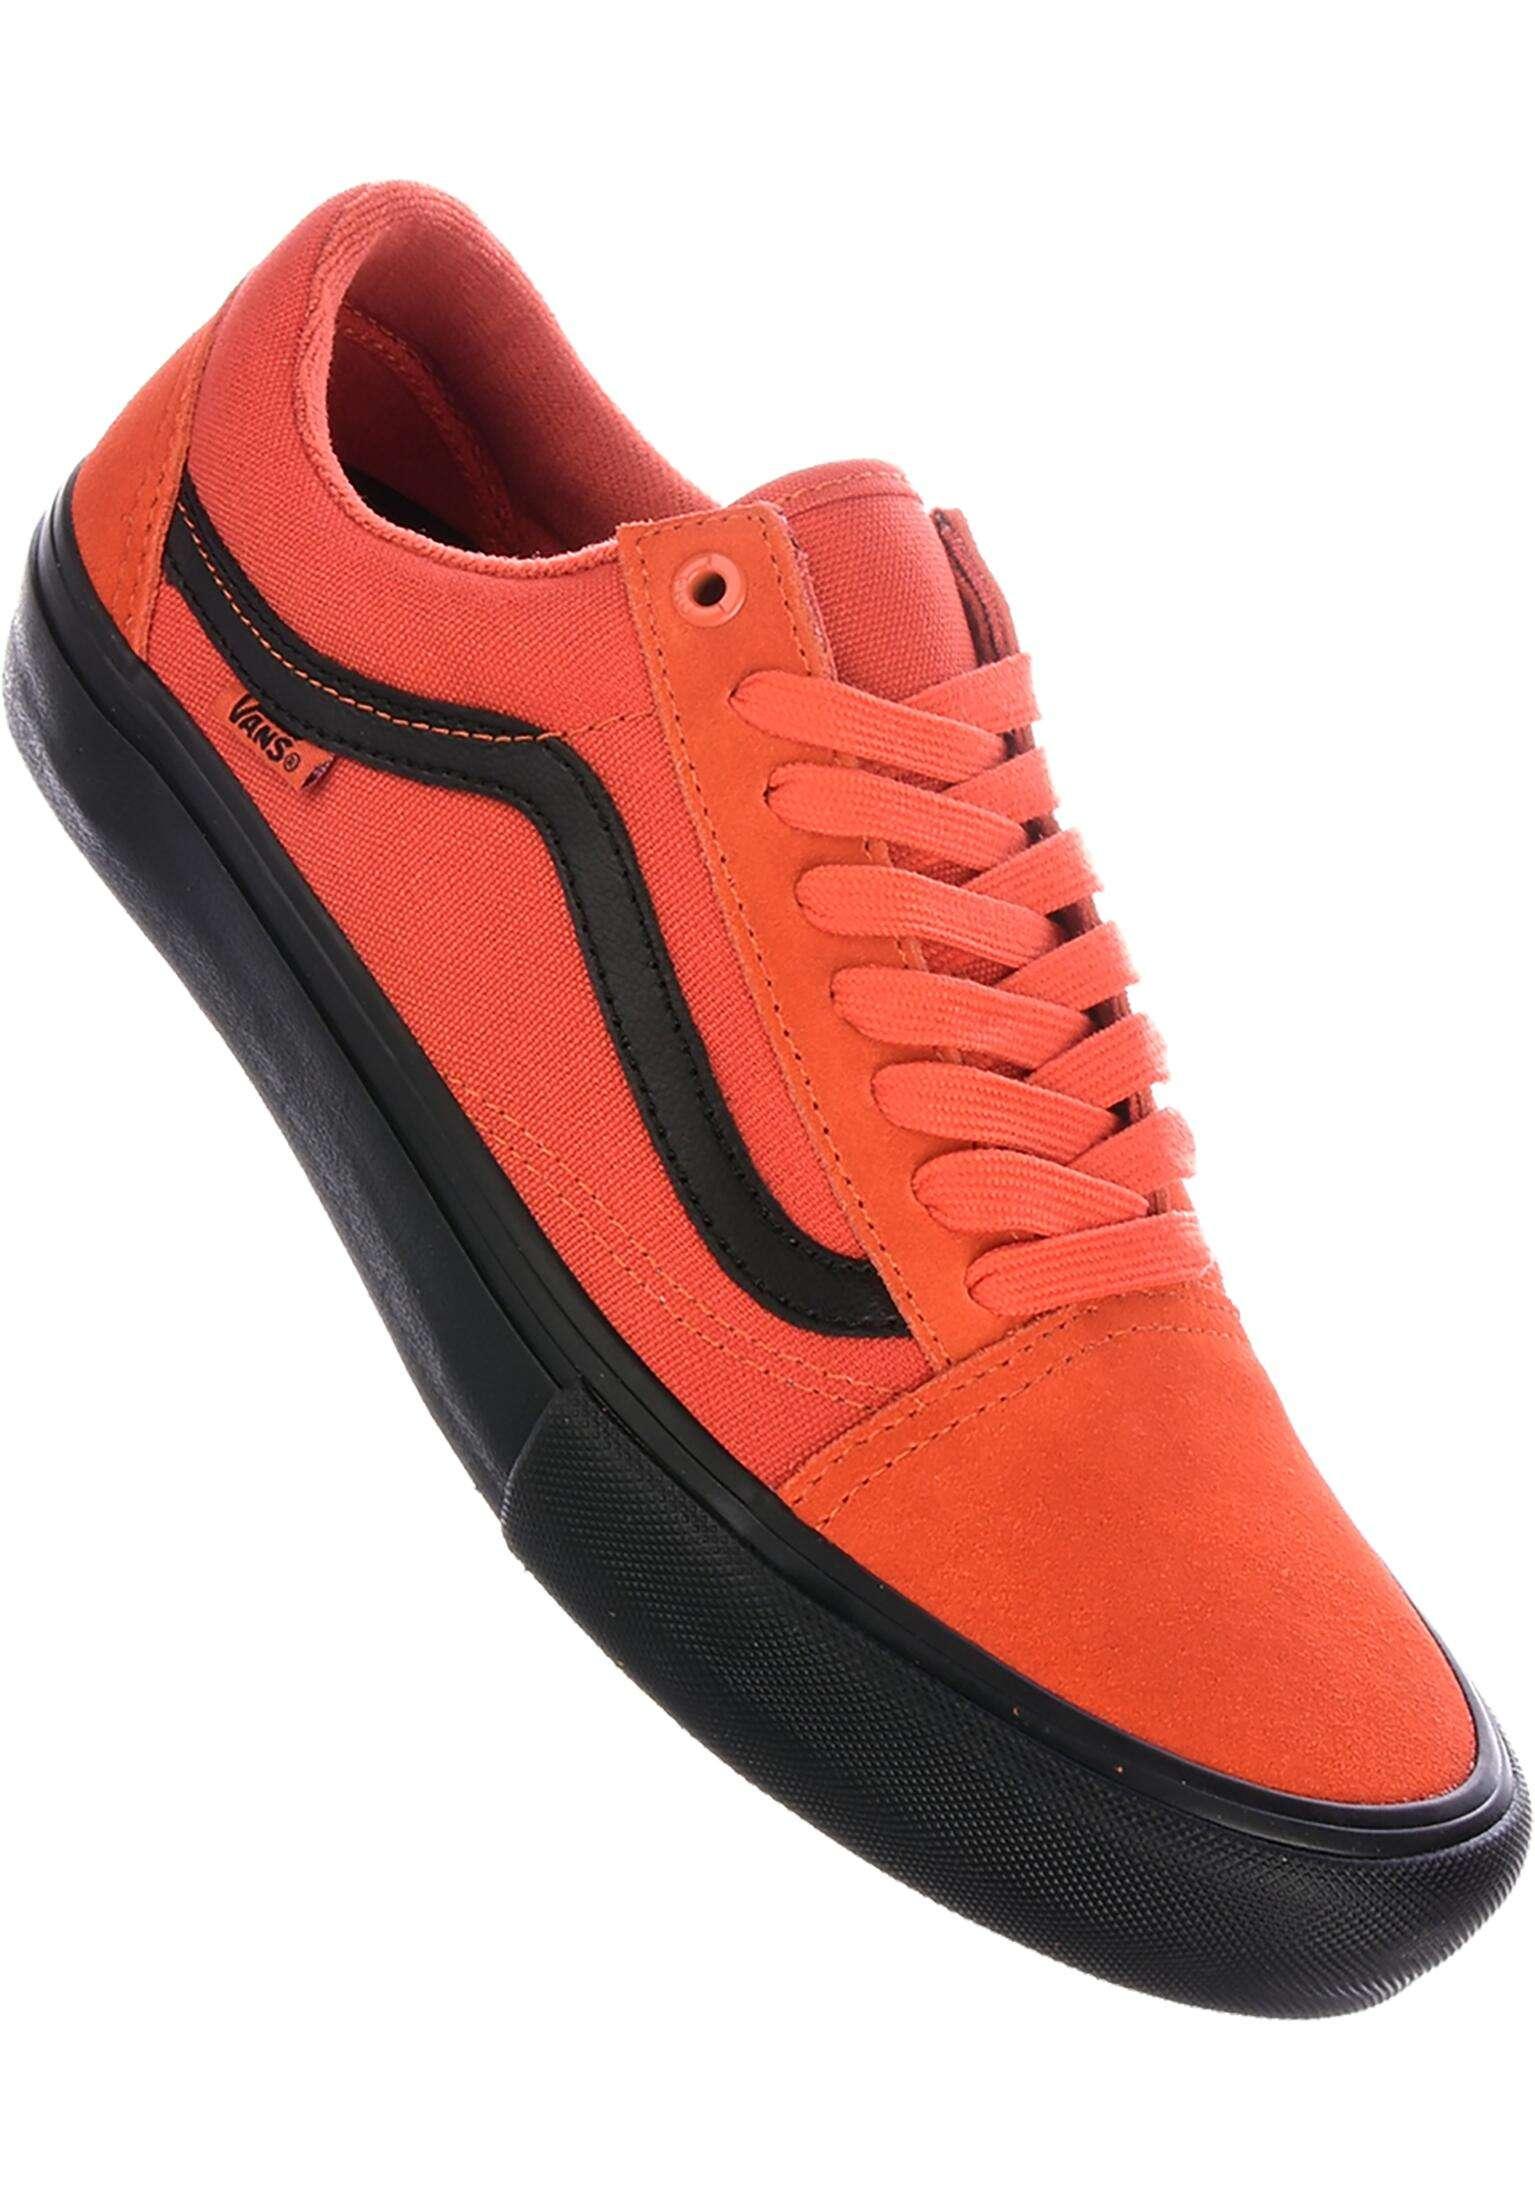 4130ce7189 Old Skool Pro Vans Alle Schuhe in koi-black für Herren | Titus